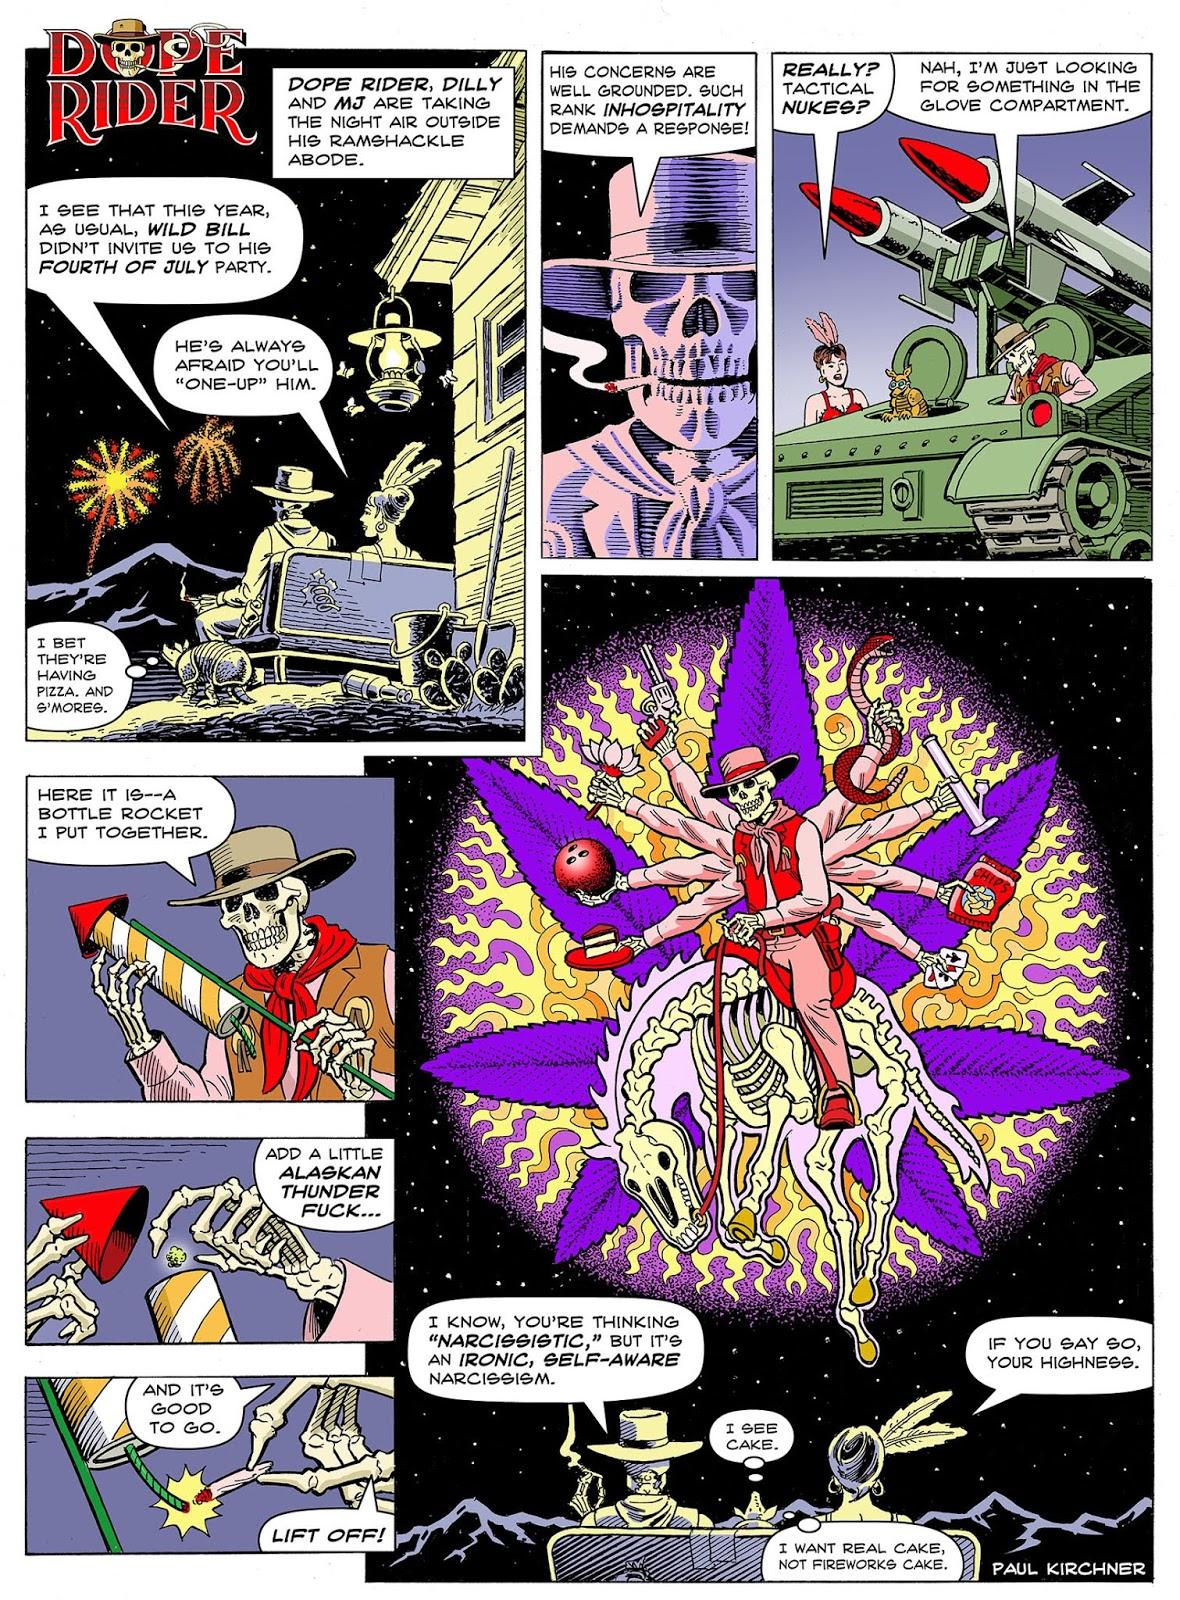 Dope Rider: Fireworks, by Paul Kirchner